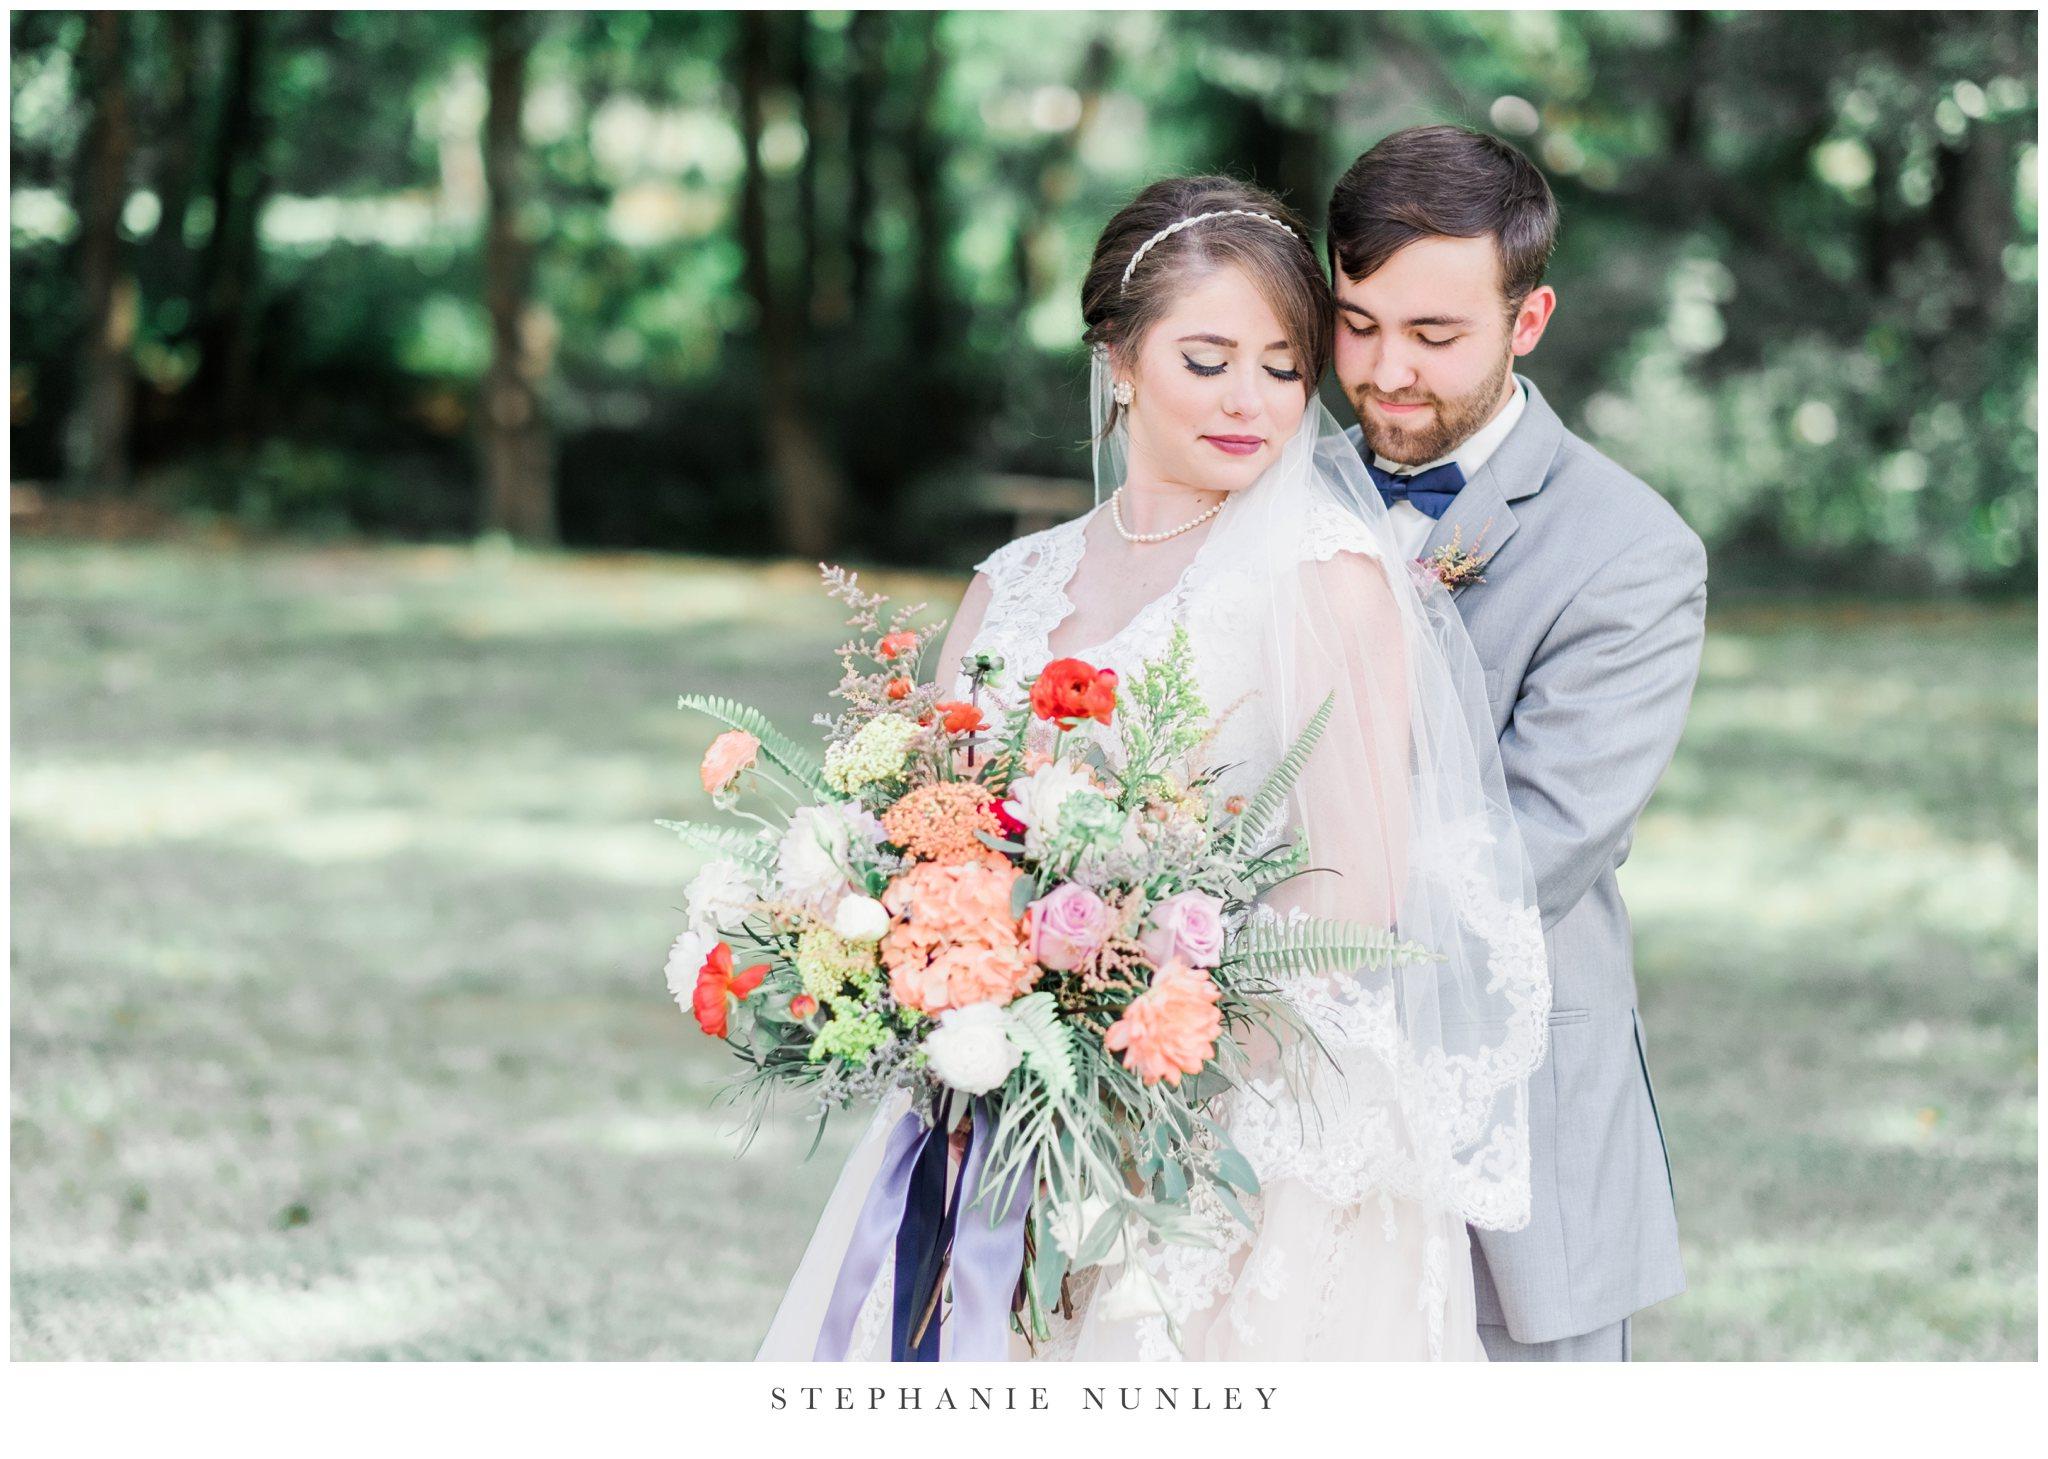 arkansas-wedding-with-lush-wildflower-bouquet-0058.jpg